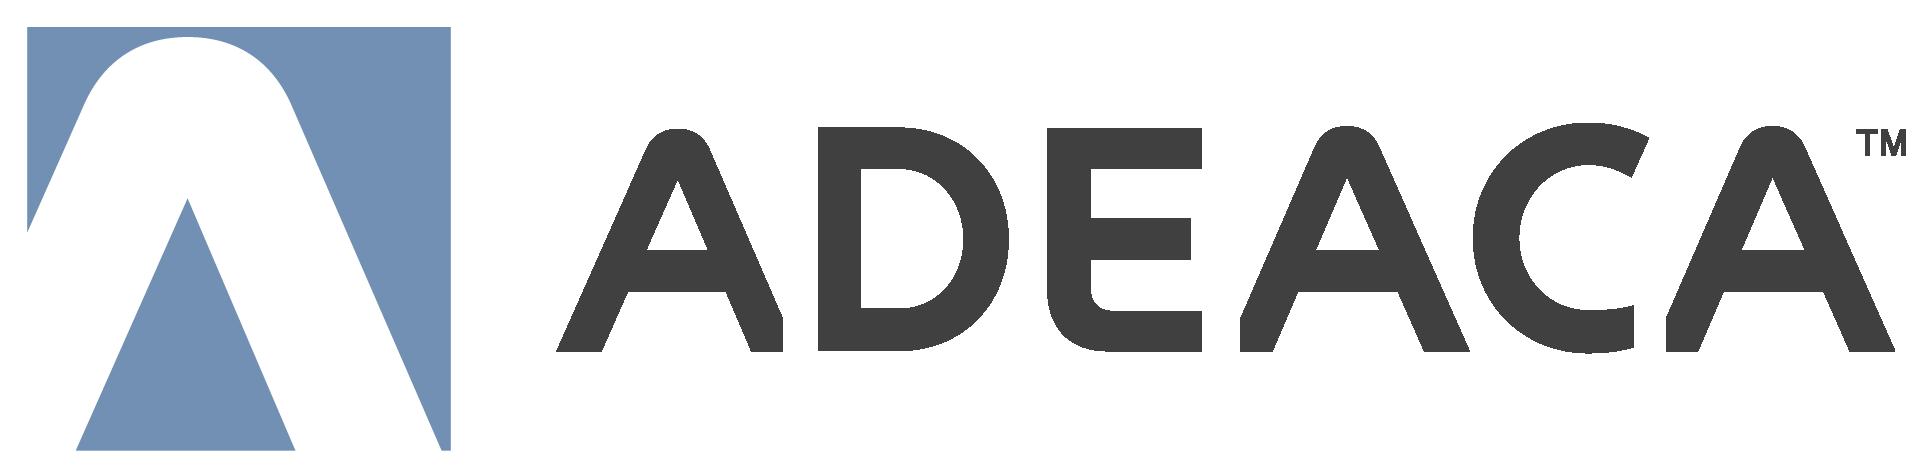 Forbes Contributor Matt Mong of Adeaca Clarifies Business Process versus Business Project